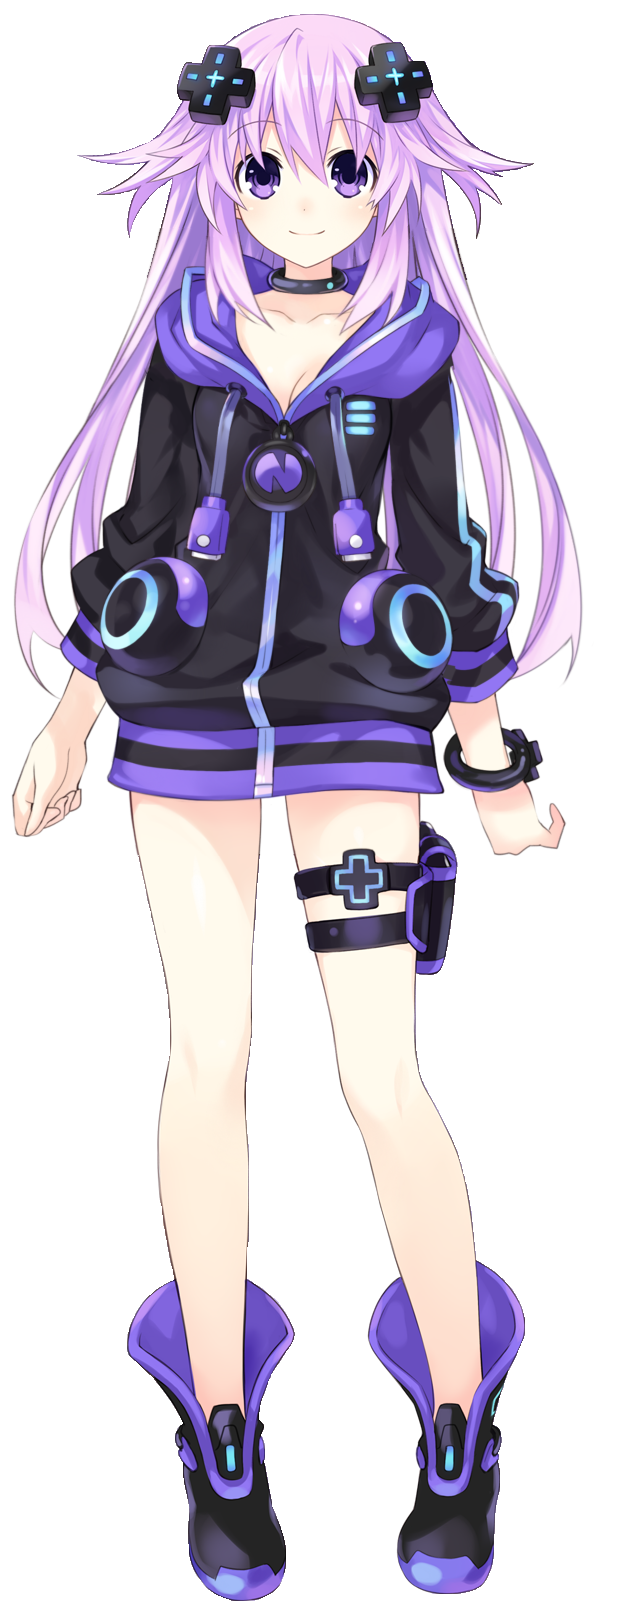 Neptune Hyperdimension Neptunia Wiki Fandom